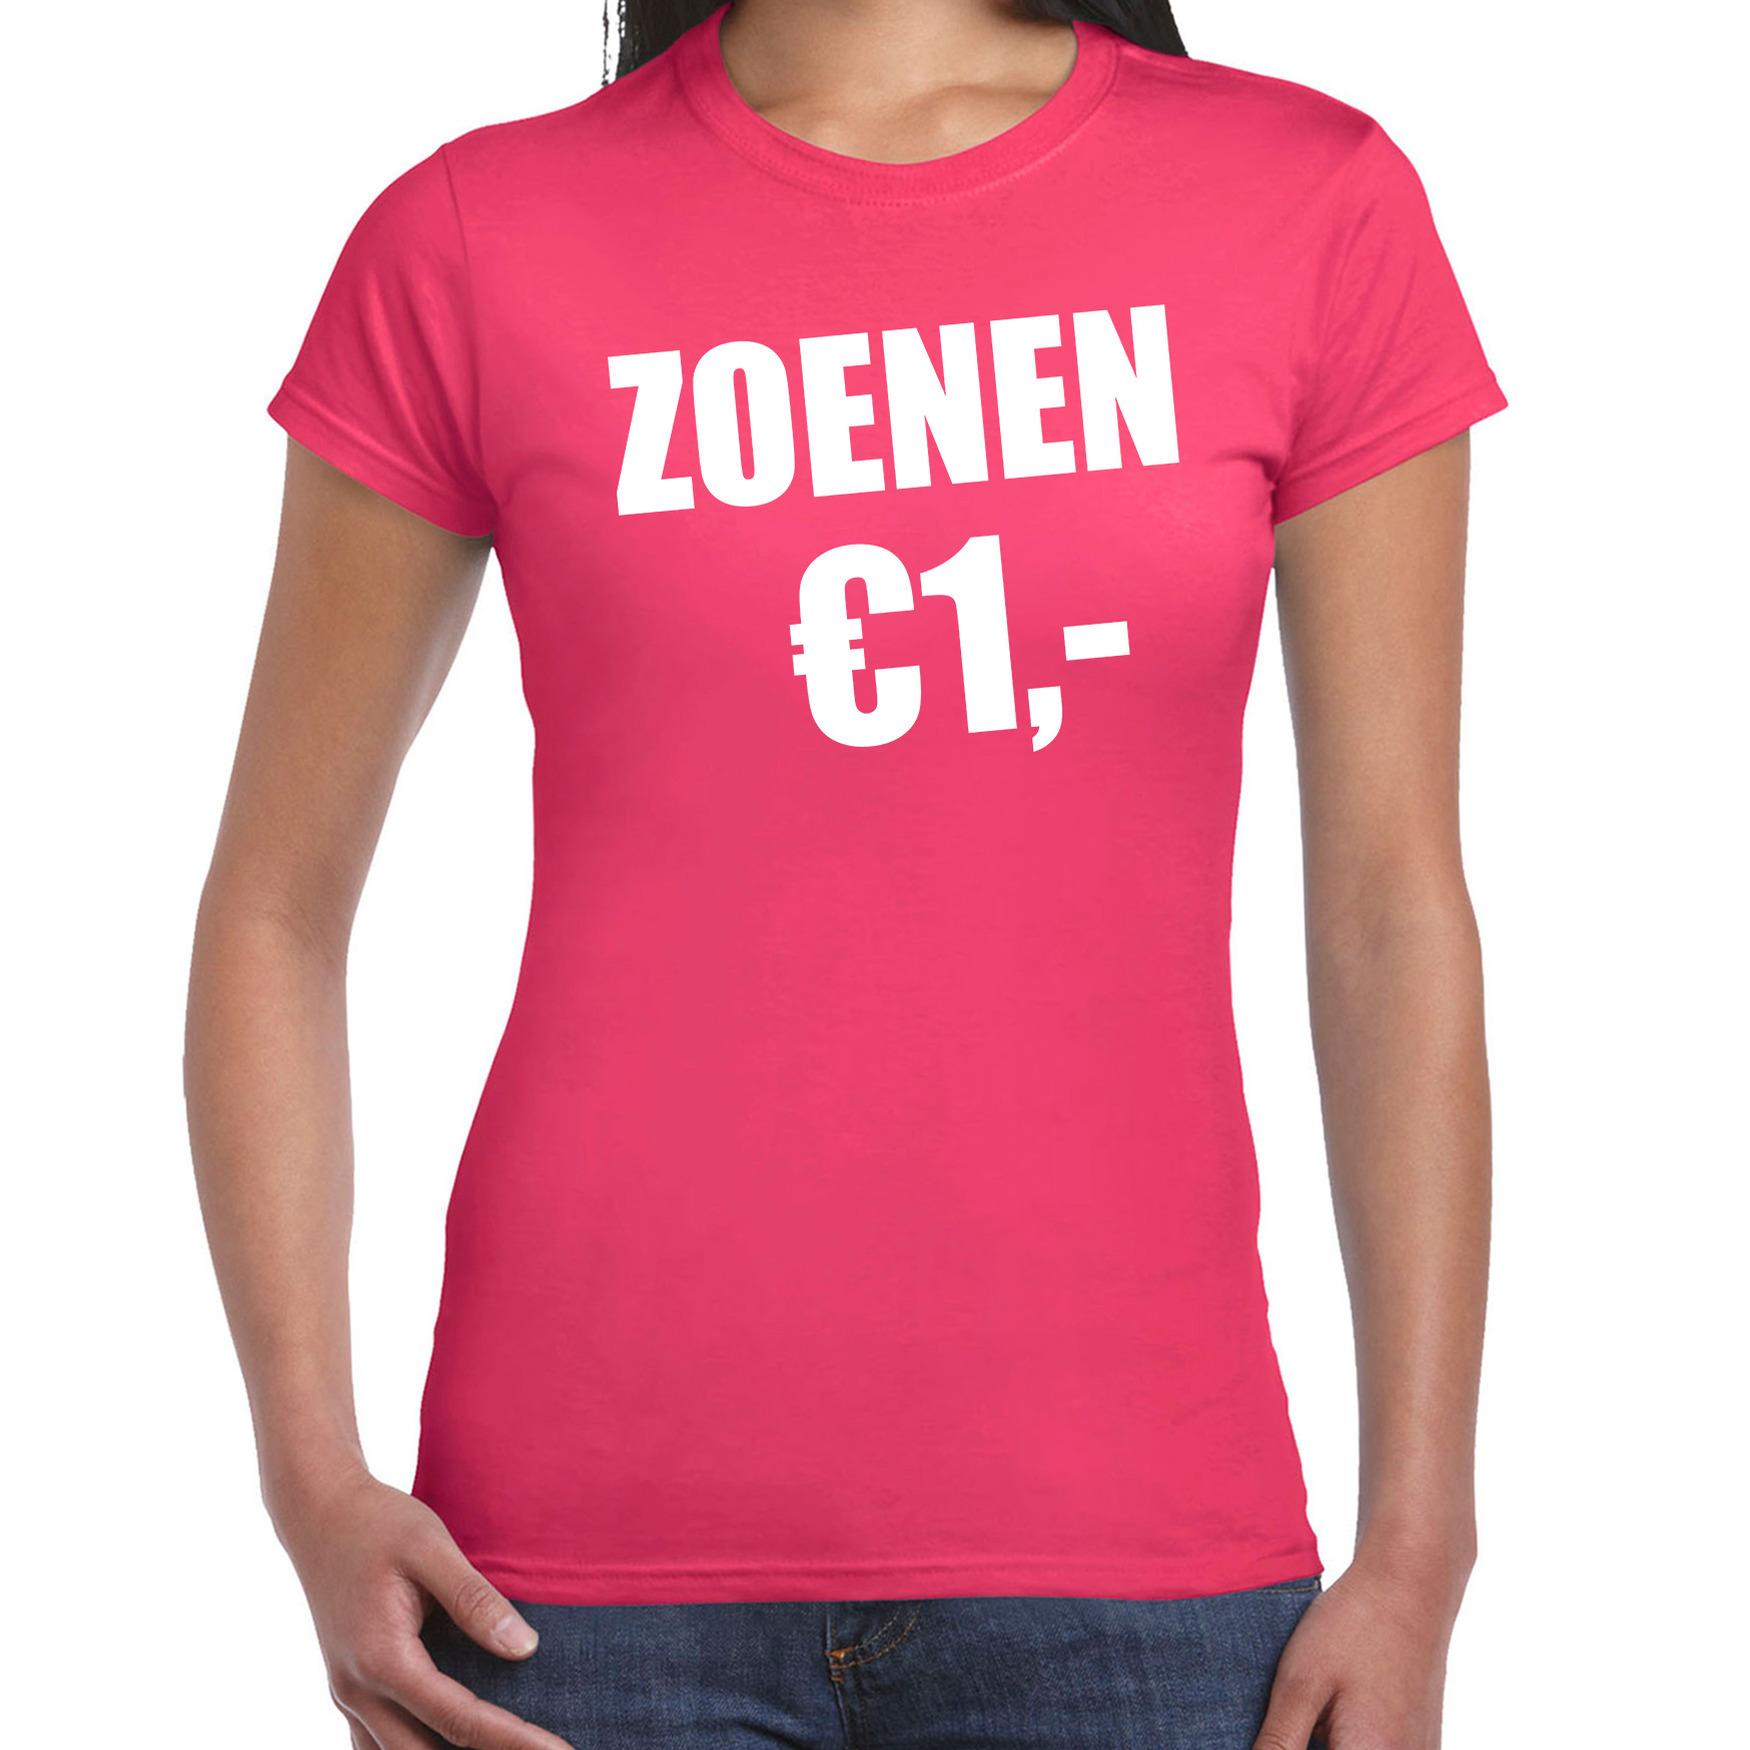 Fun t-shirt zoenen 1 euro roze voor dames S -